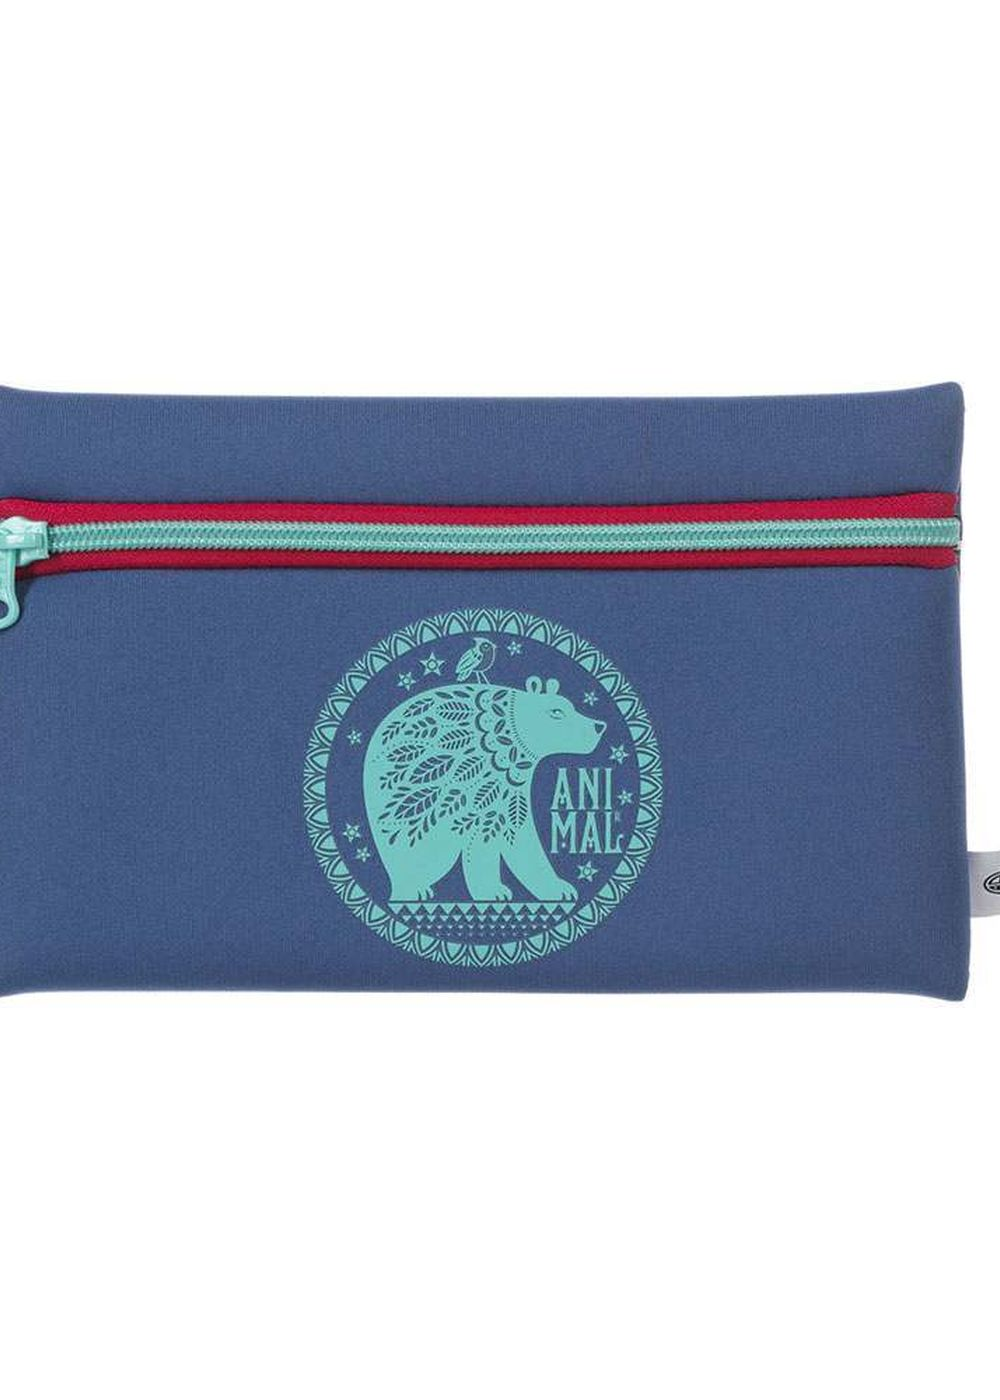 animal noely pencil case vintage blue